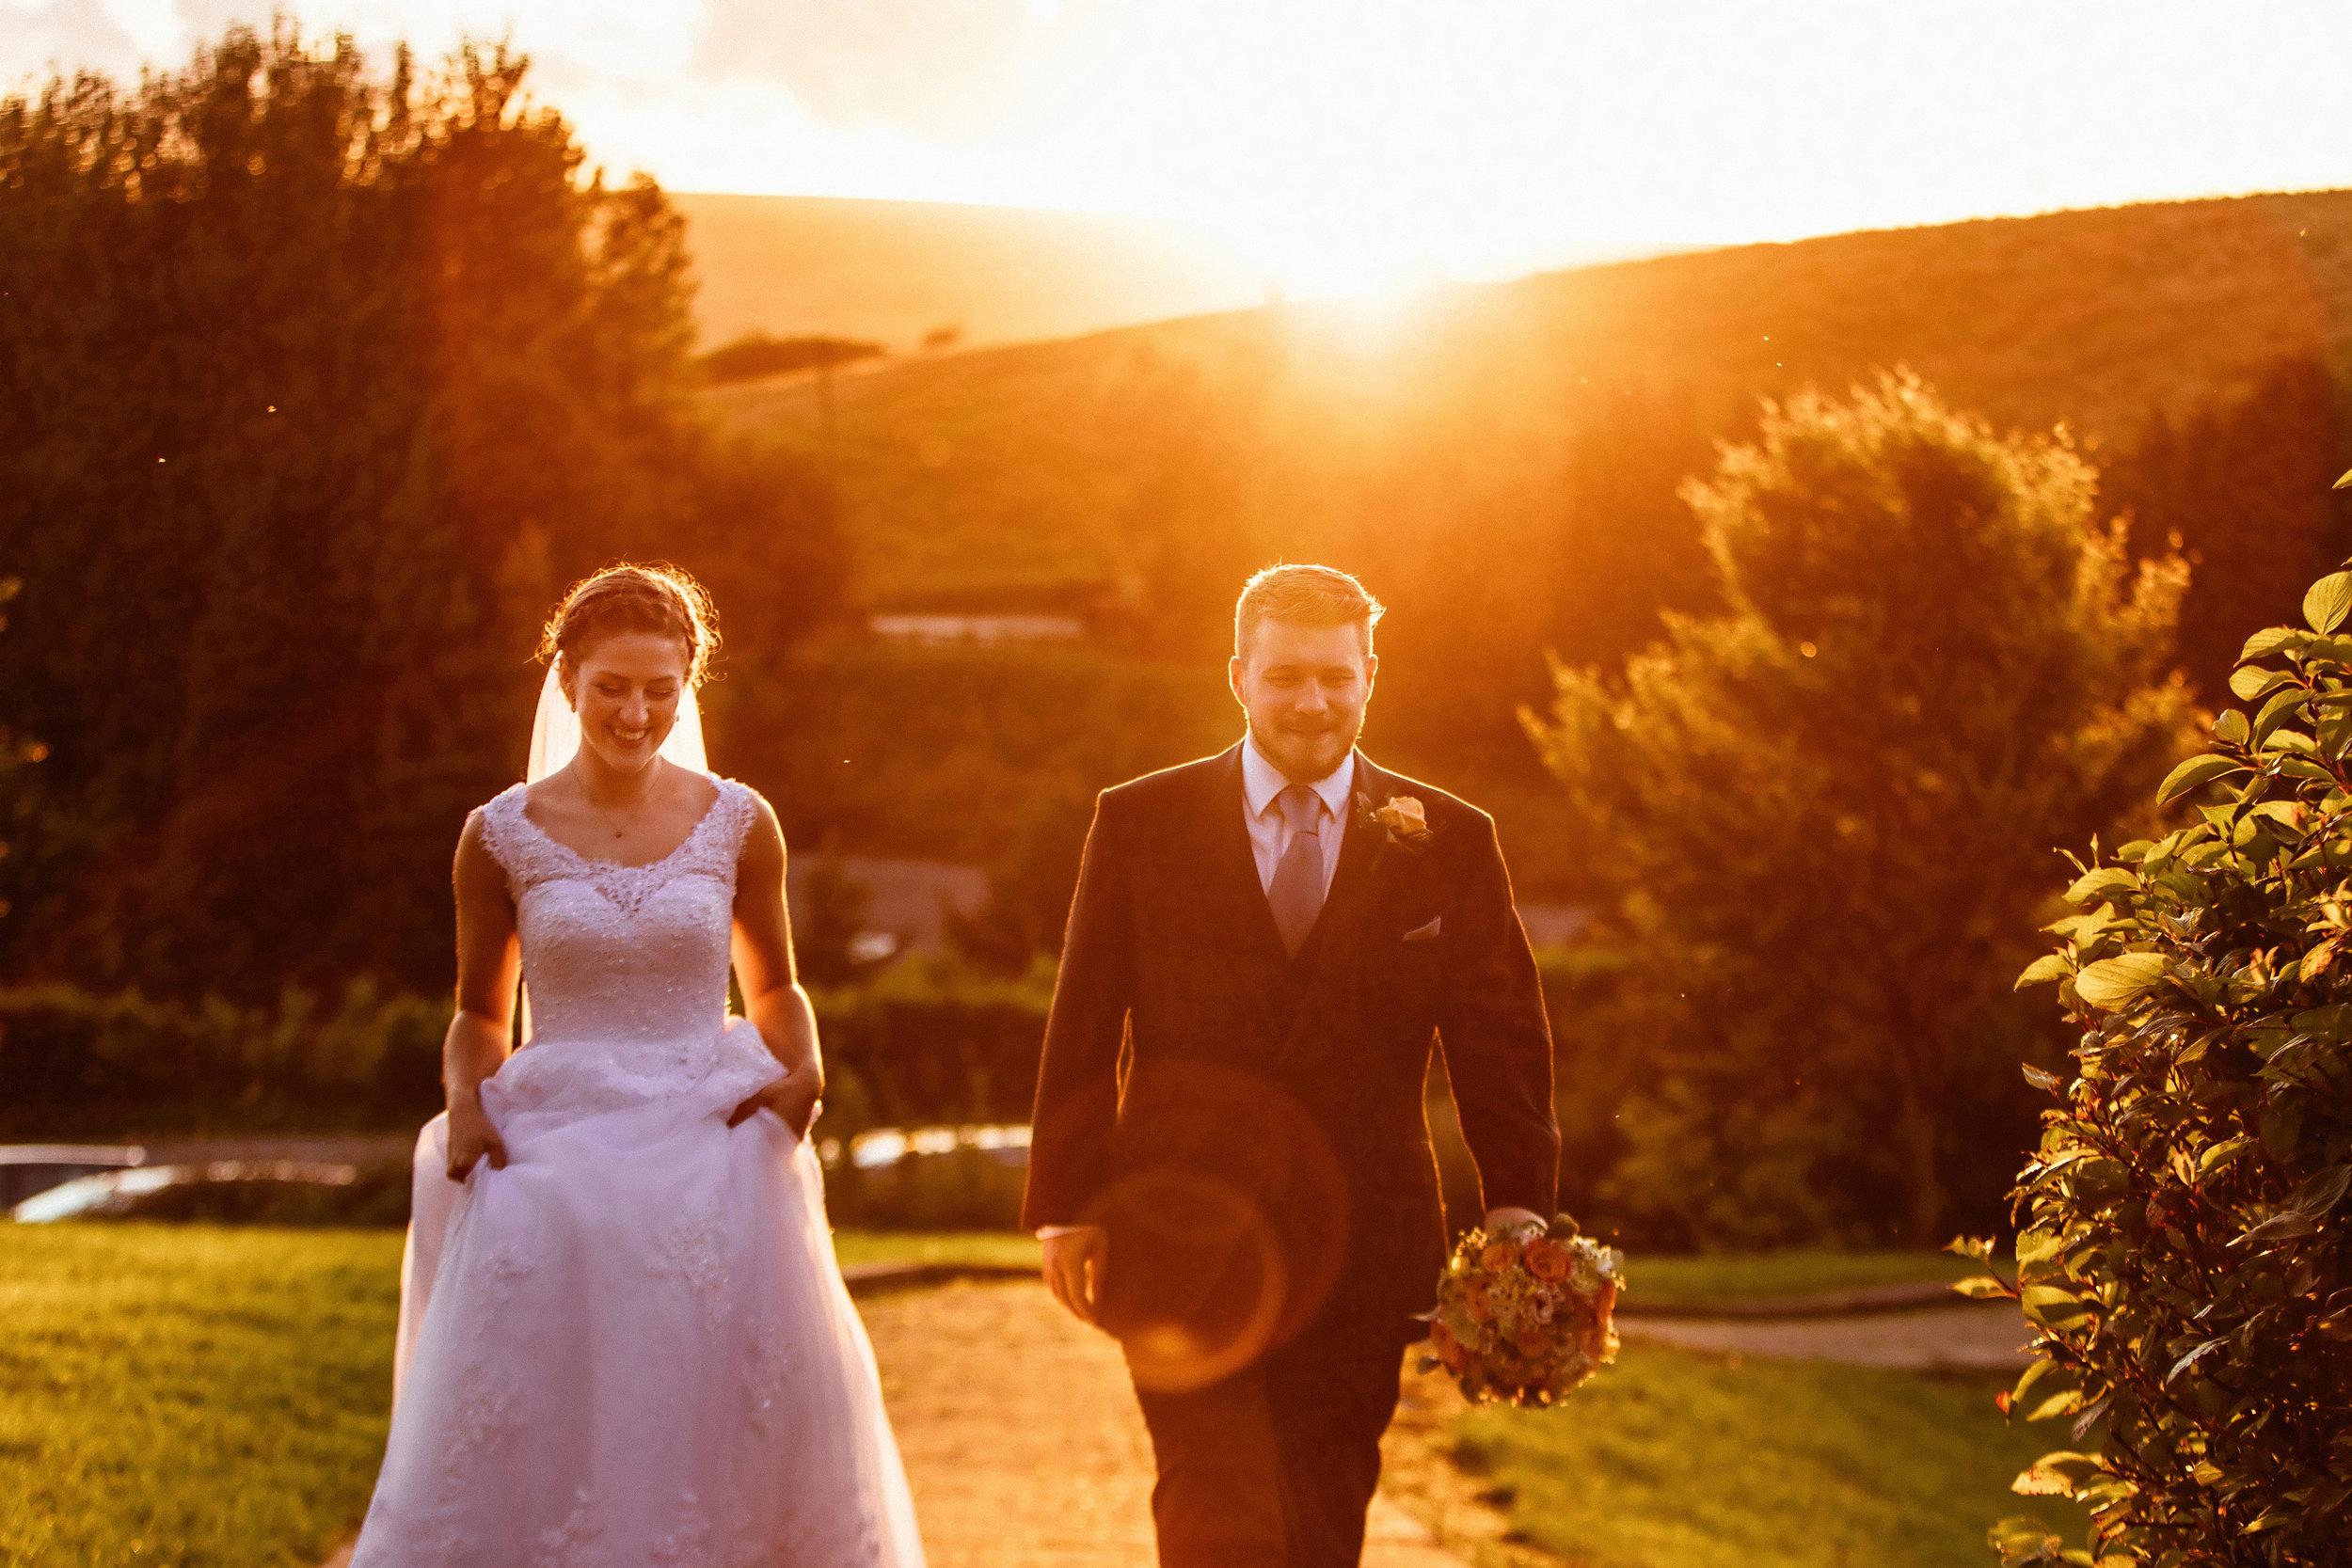 Kathryn-and-Mike-Wedding-Highlights-99.jpg